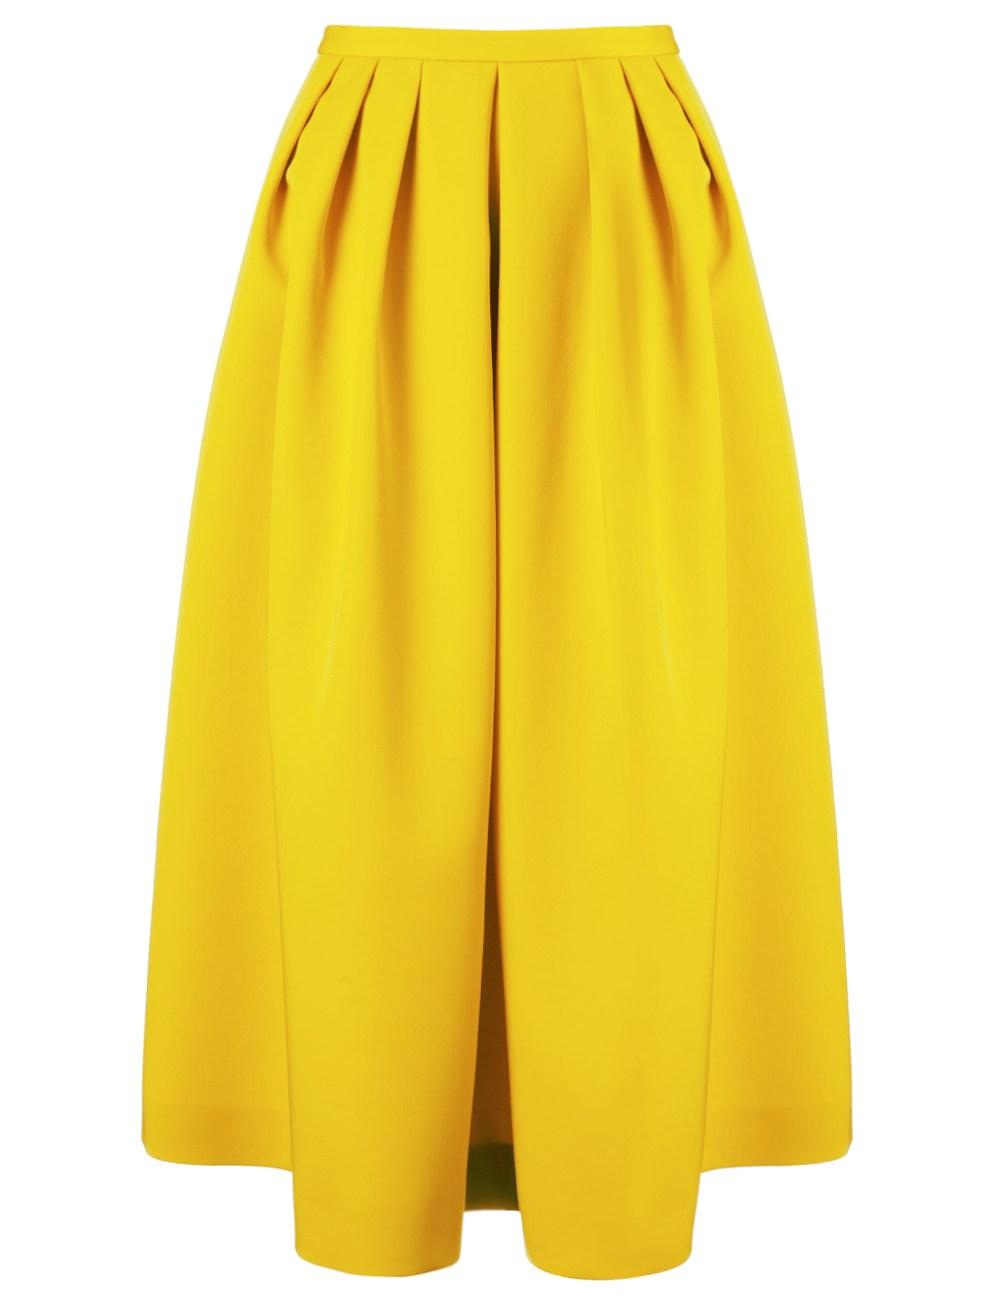 antonio marras yellow wool midi skirt in yellow lyst